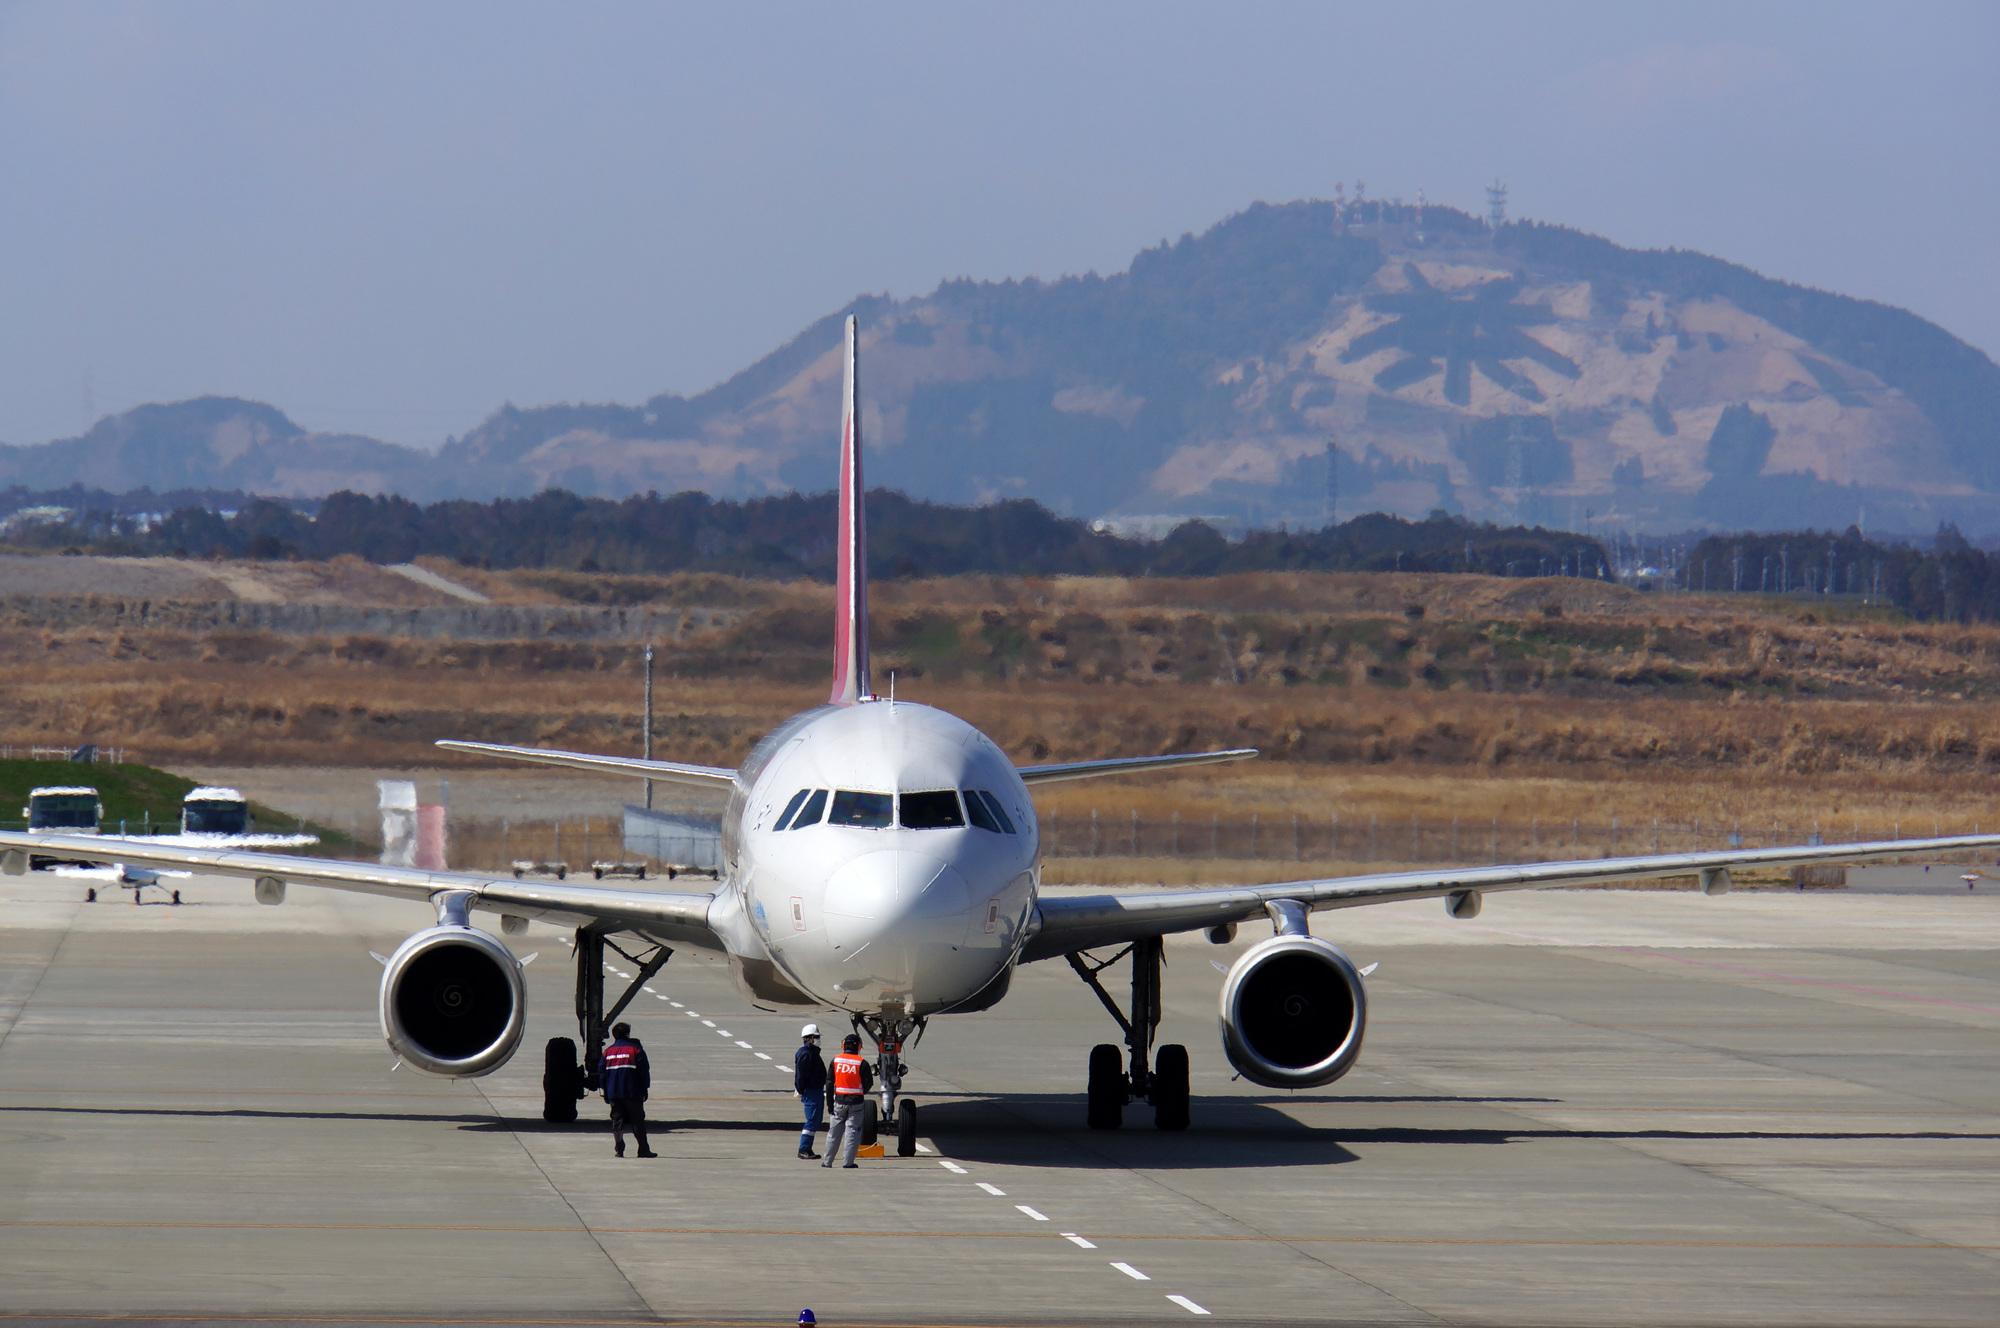 FDA(フジドリームエアラインズ)の福岡発着の便を利用した航空券の料金はどれくらい? srcset=